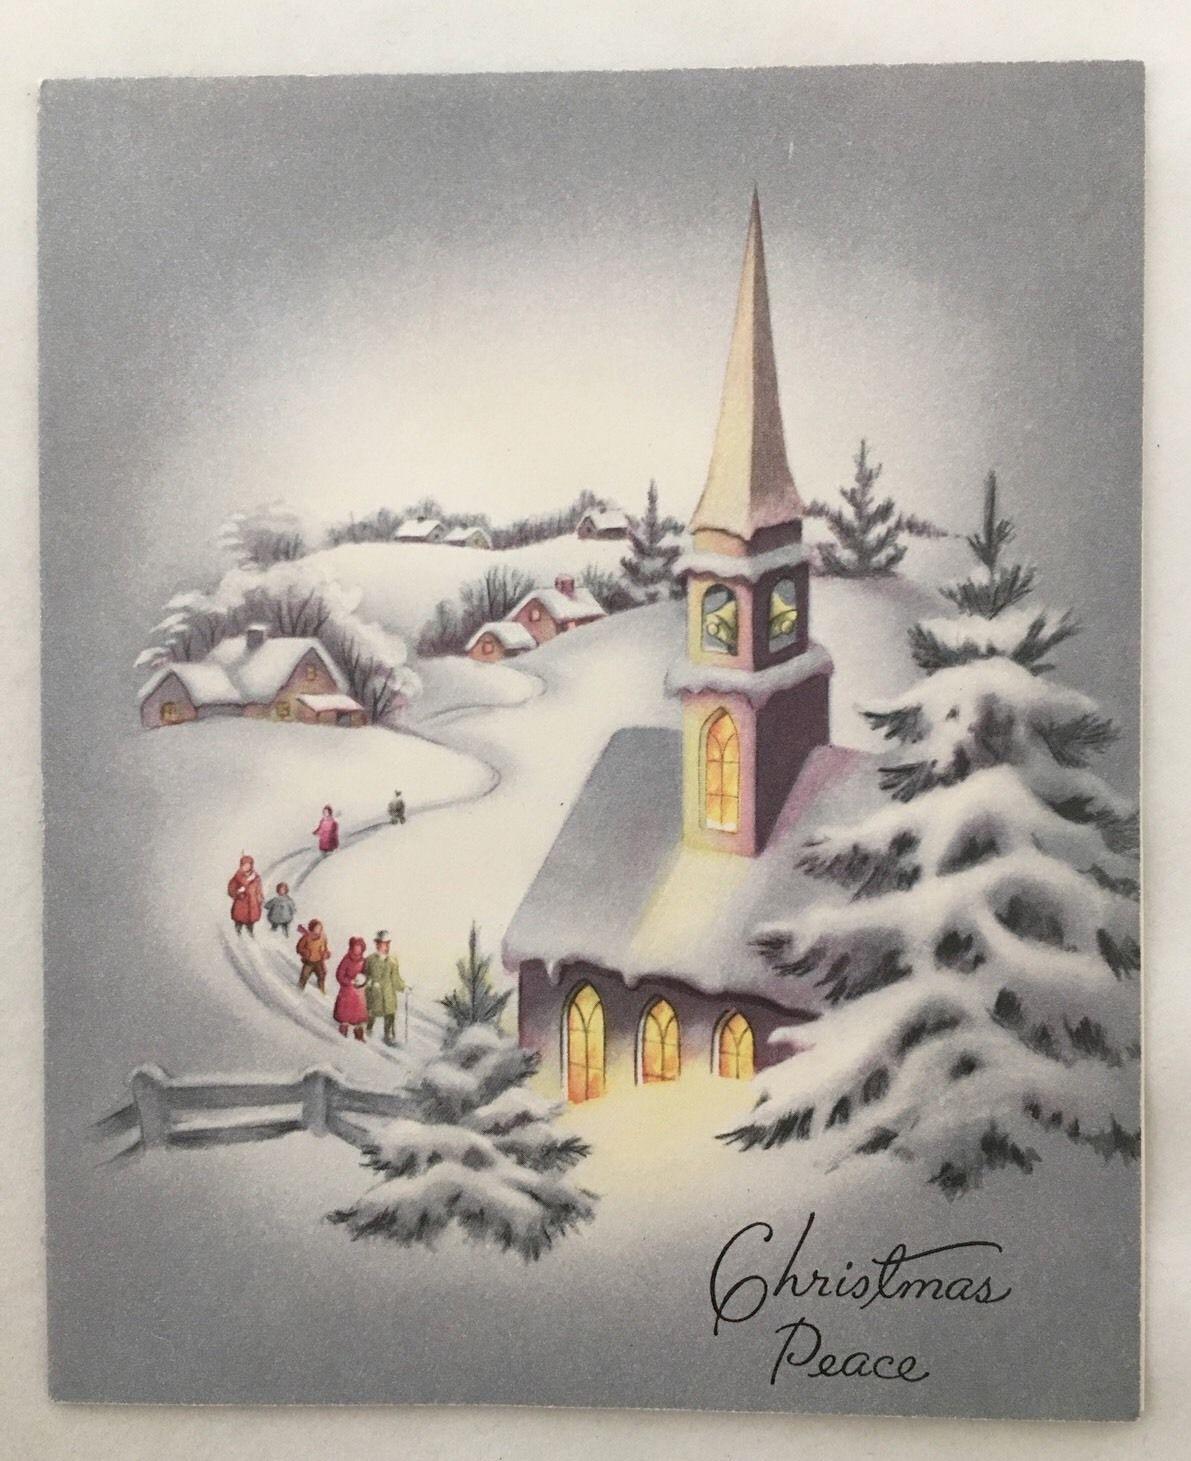 Charmant Vintage Christmas Card Snowy Neighborhood Church People Houses Trees Town  USA   EBay